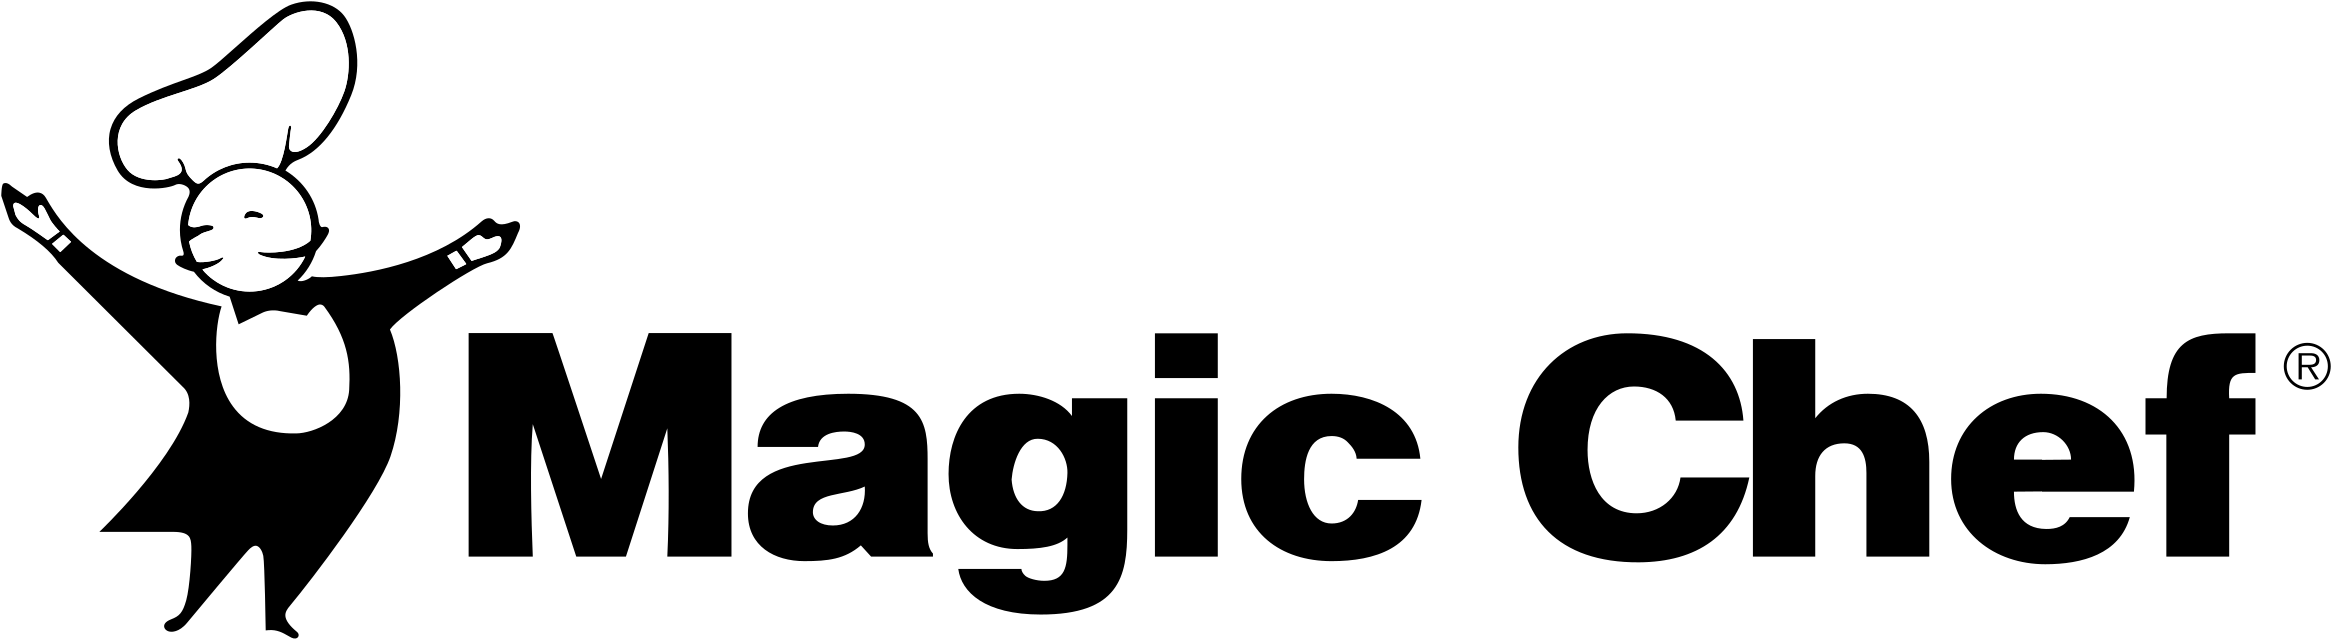 Magic Chef logo